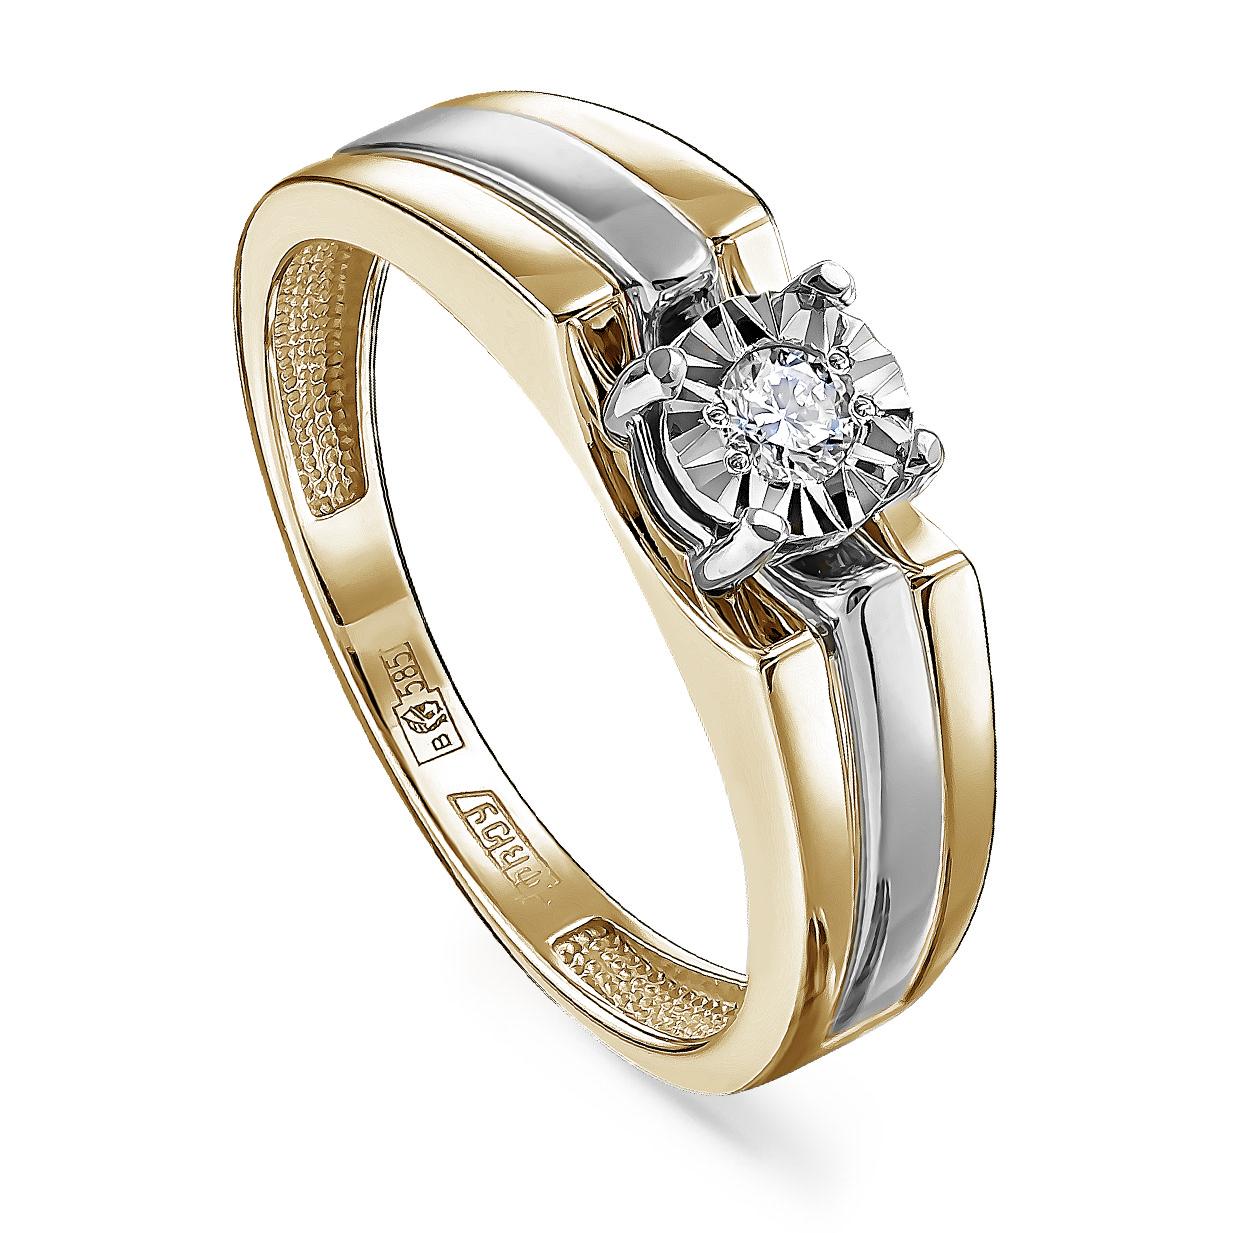 Кольцо из лимонного золота Бриллиант арт. 11-21245-1000 11-21245-1000